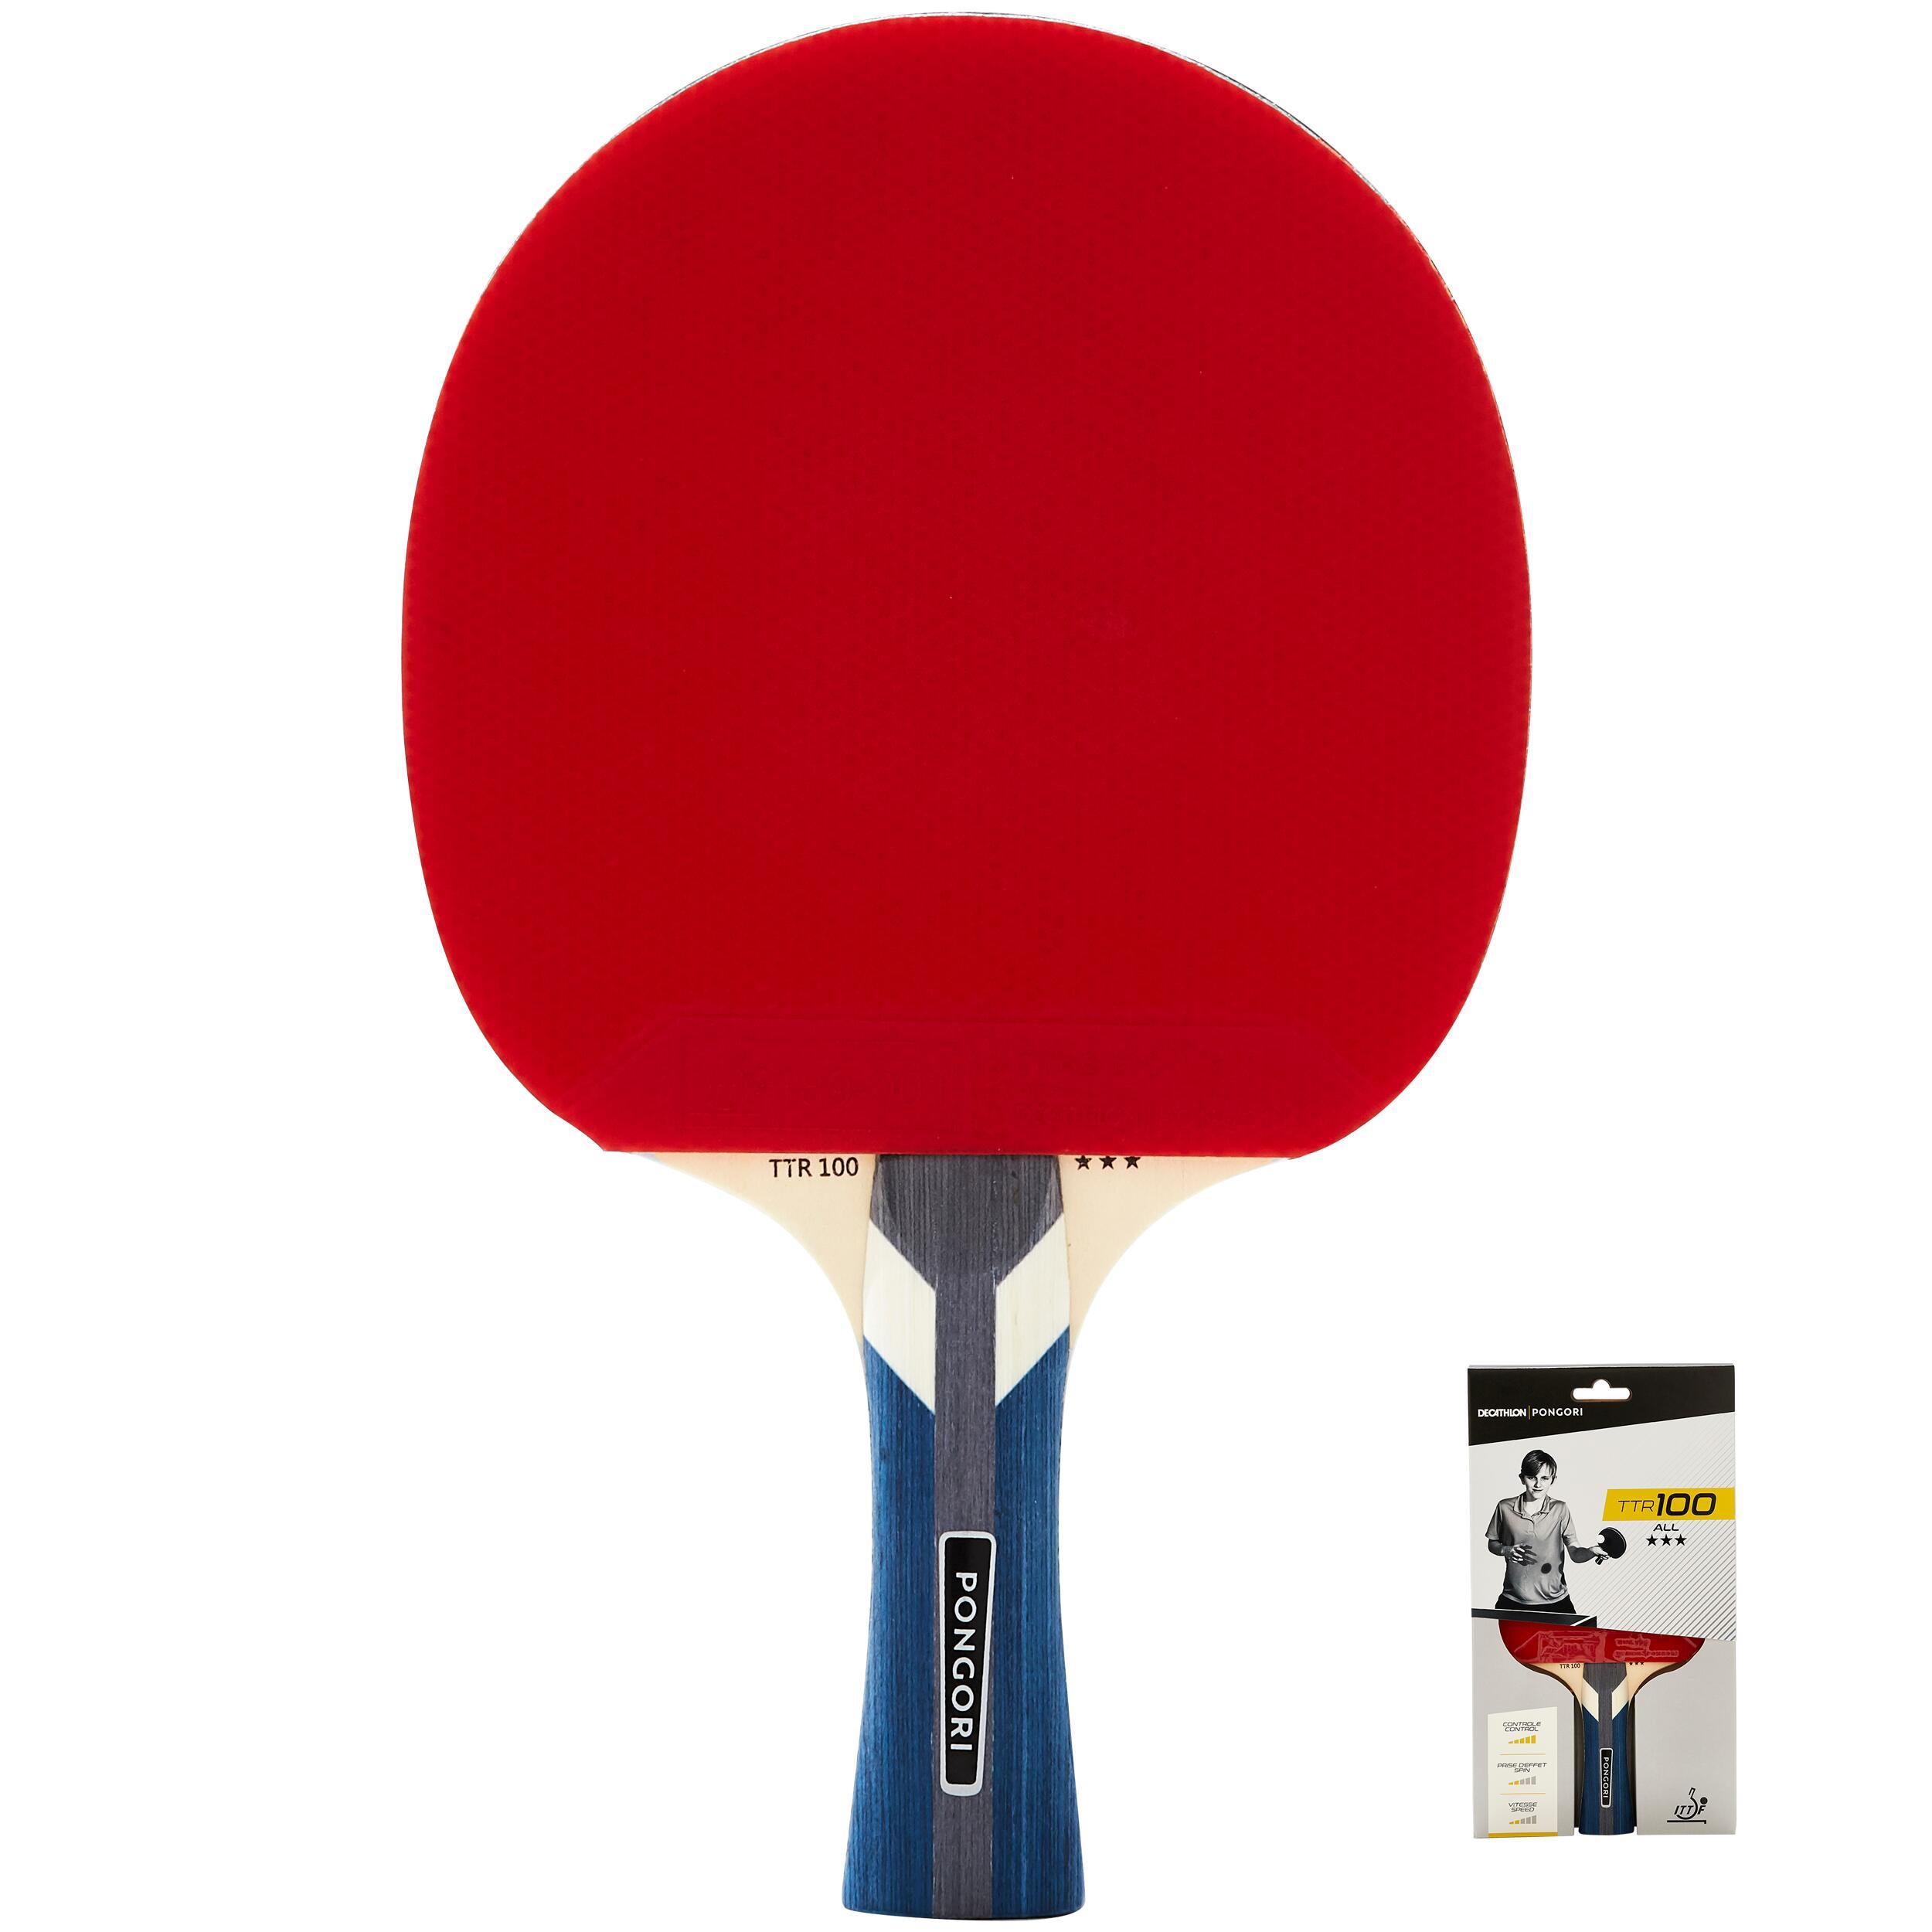 Paletă Tenis TTR100 3*ALLROUND imagine